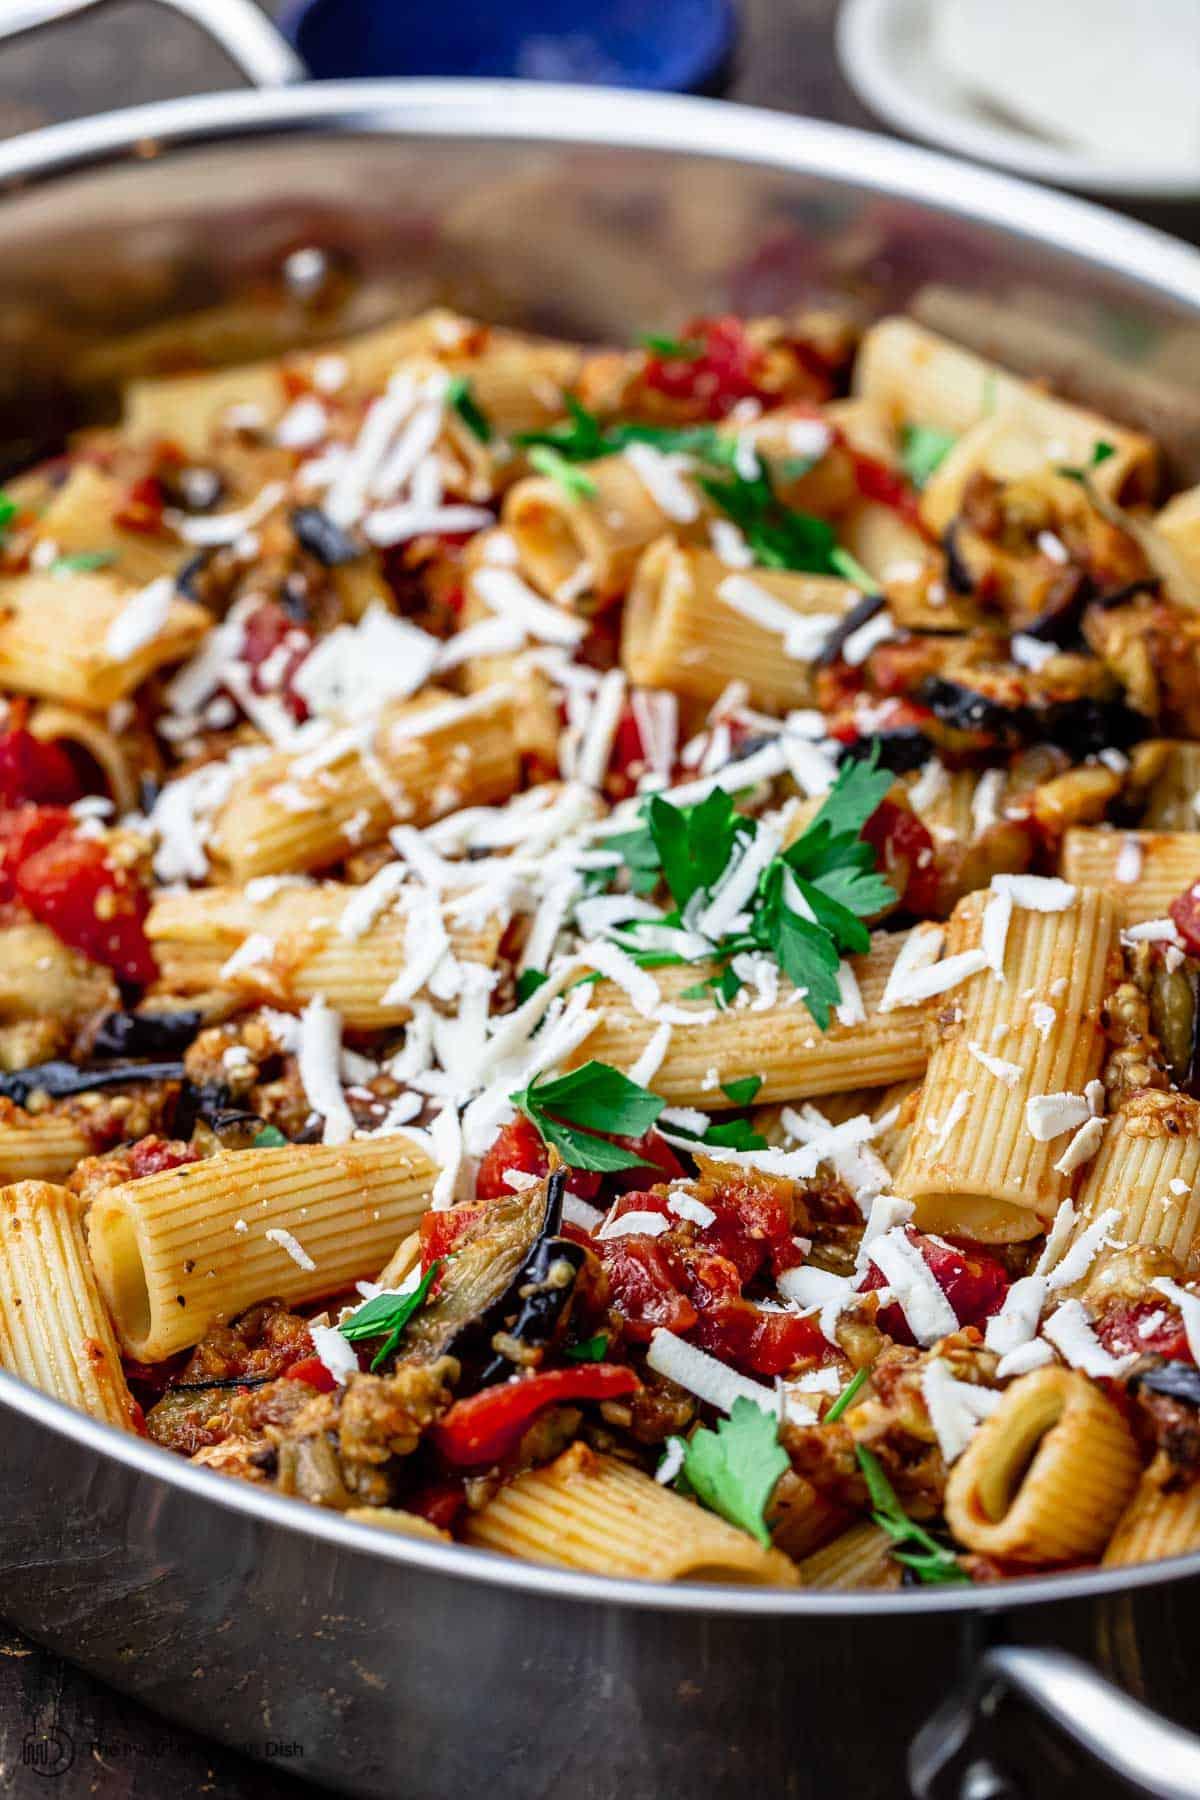 pasta alla norma (eggplant pasta) in a pan